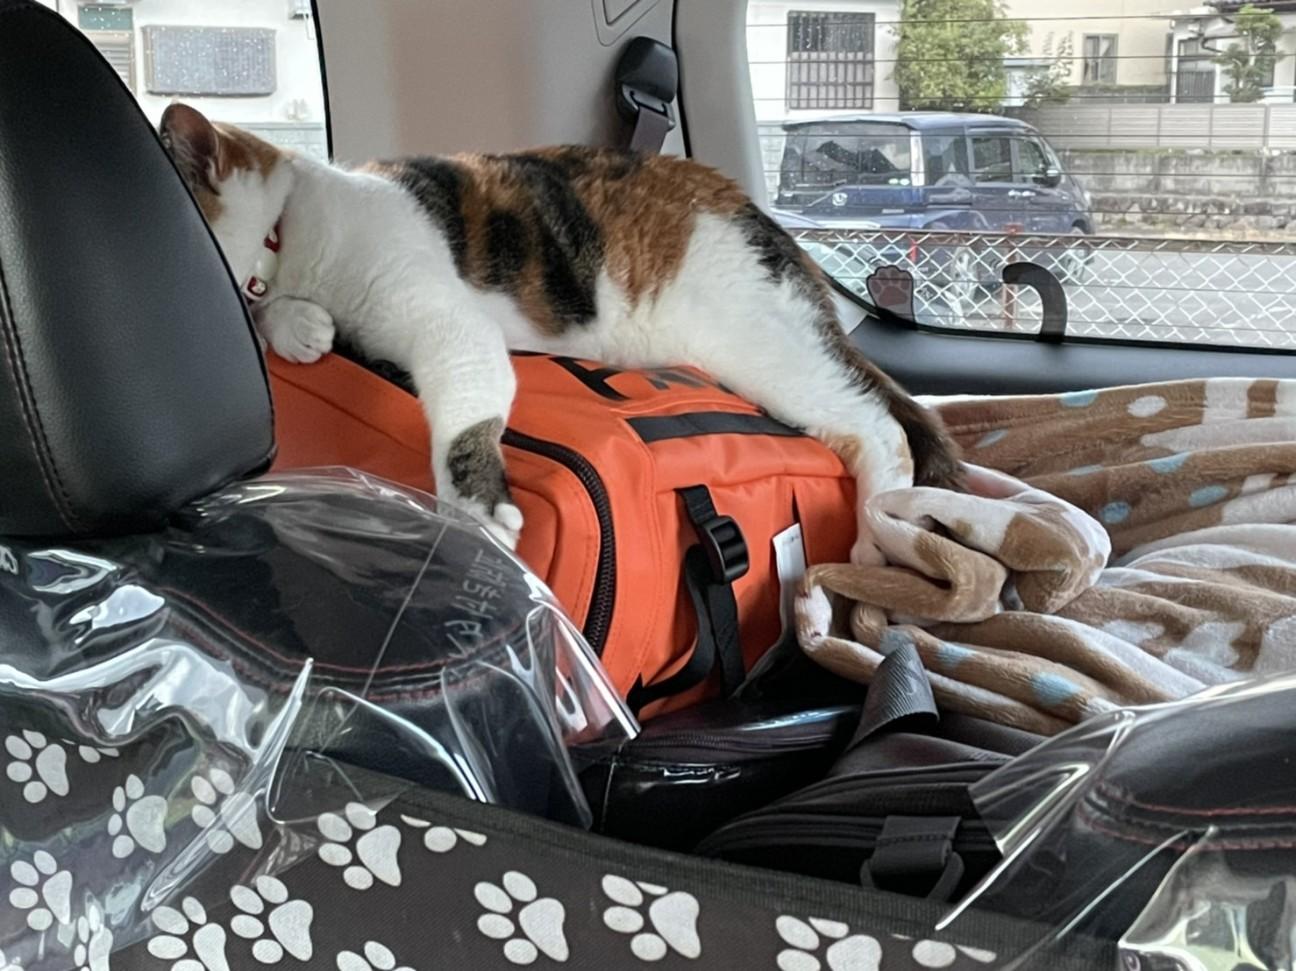 f:id:Three_Traveling_Cats:20210715205810j:image